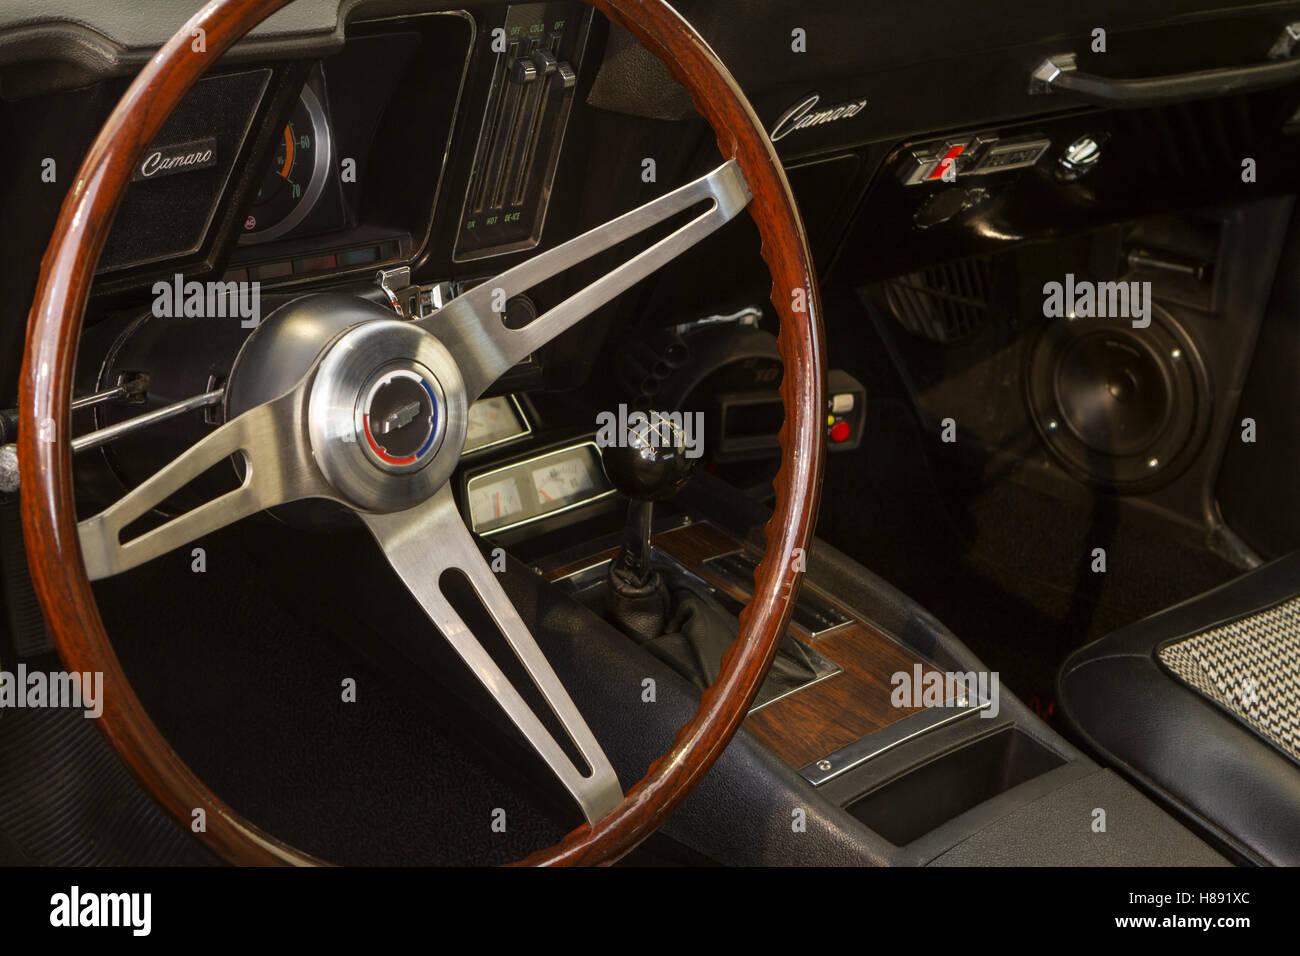 Dashboard of 1969 Chevrolet Camaro Stock Photo: 125588916 - Alamy